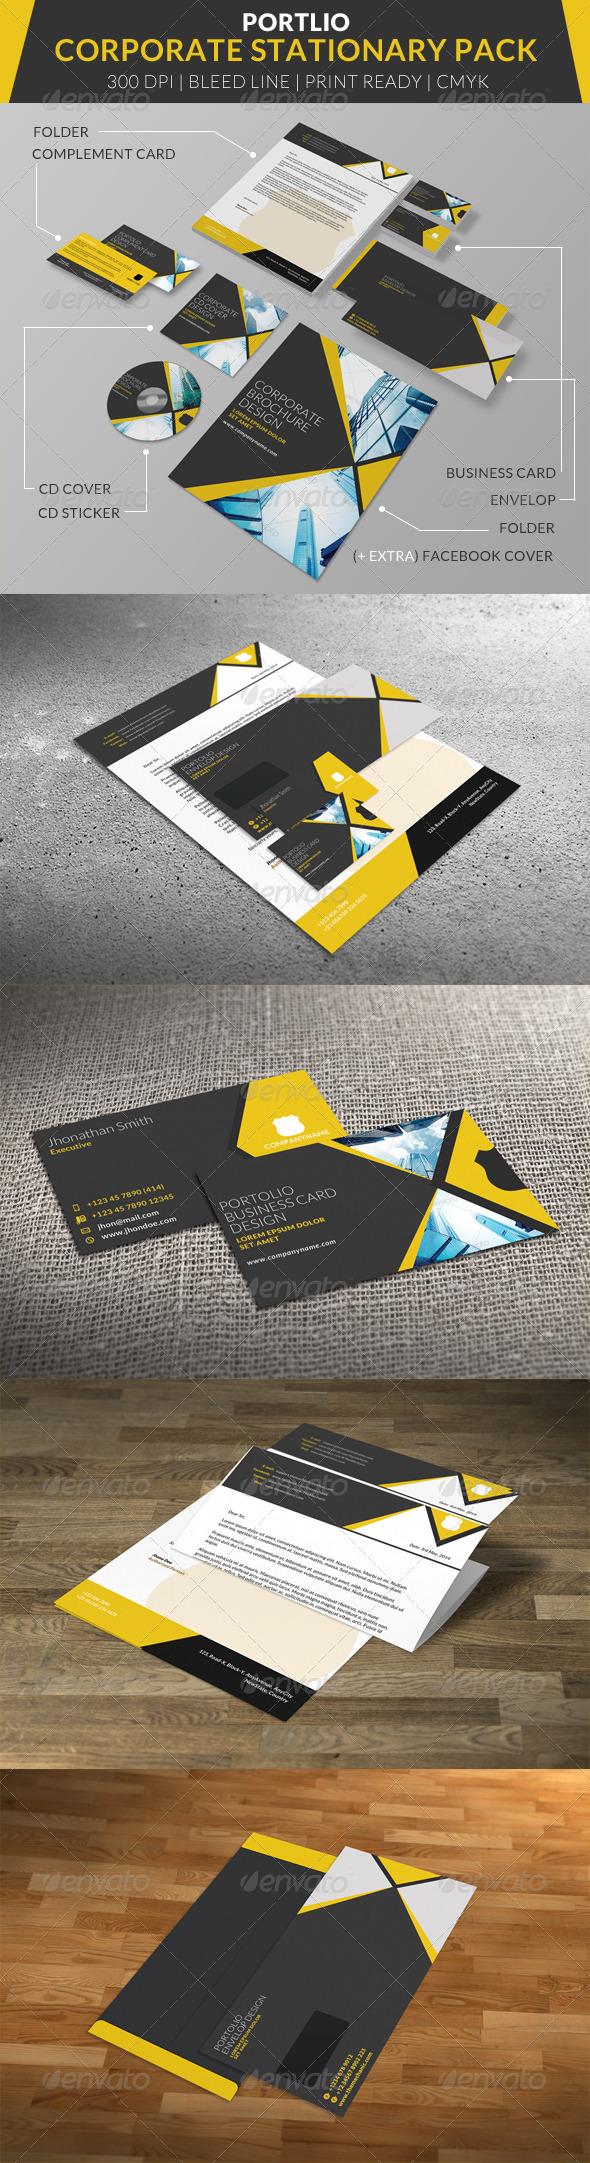 GraphicRiver Portolio Corporate Stationary Pack 7663211